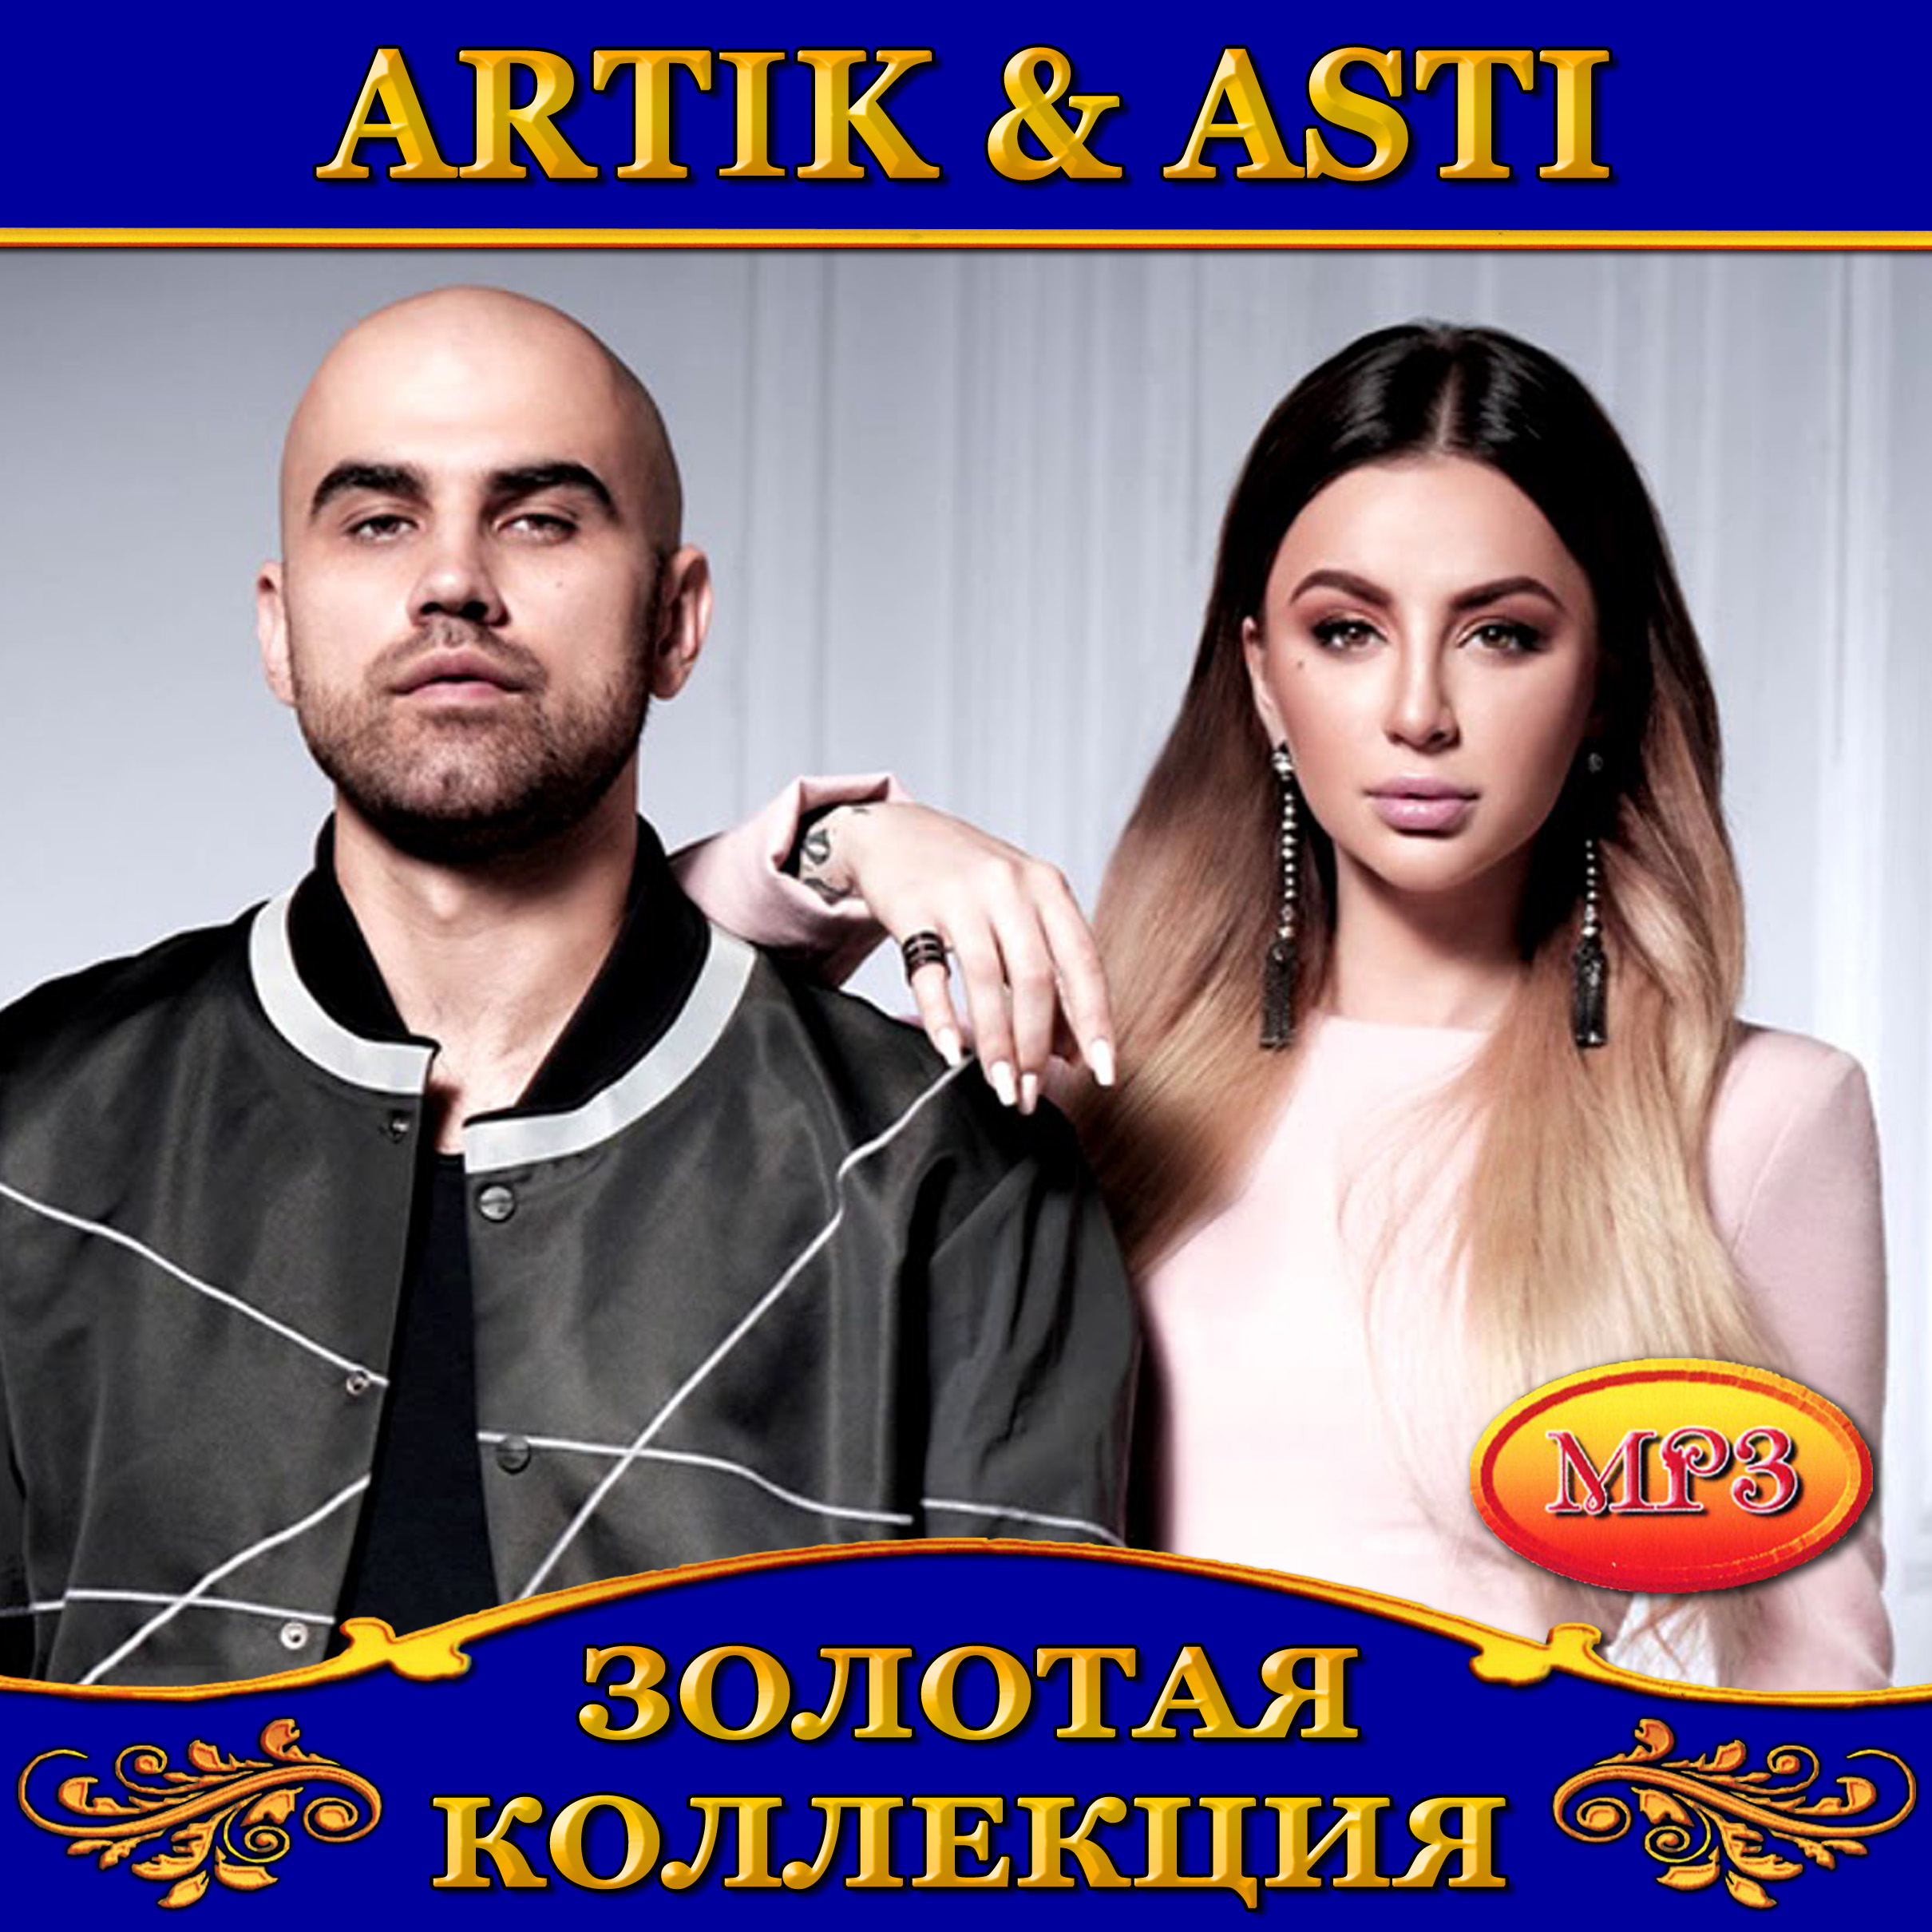 Artik & Asti [mp3]